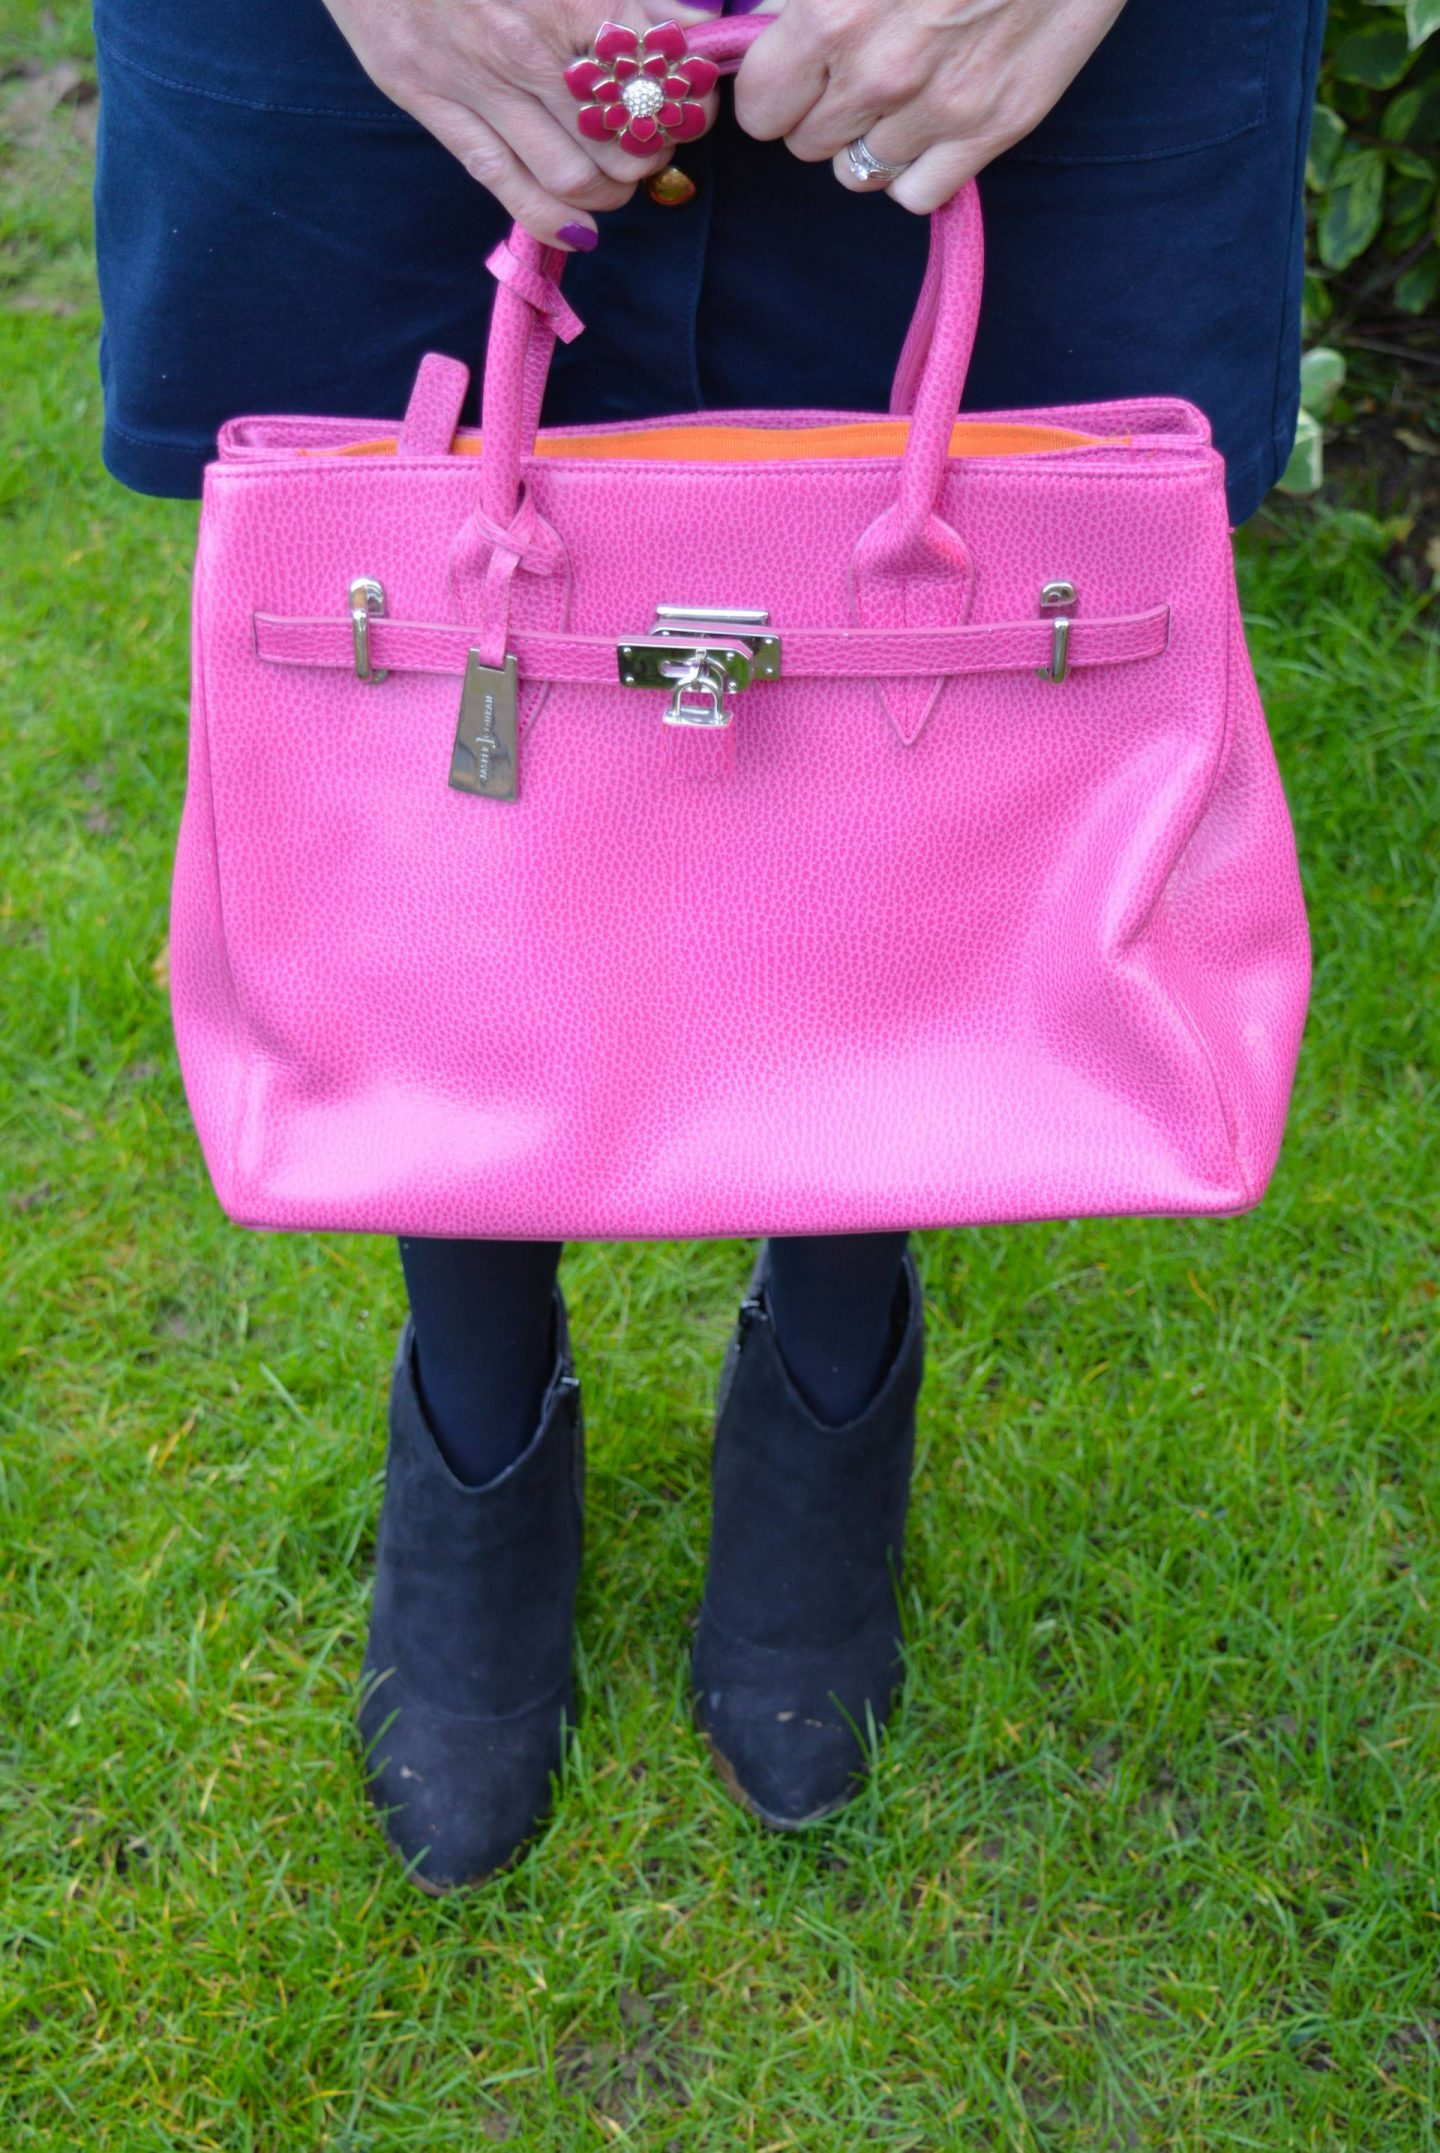 pink J by Jasper Conran bag